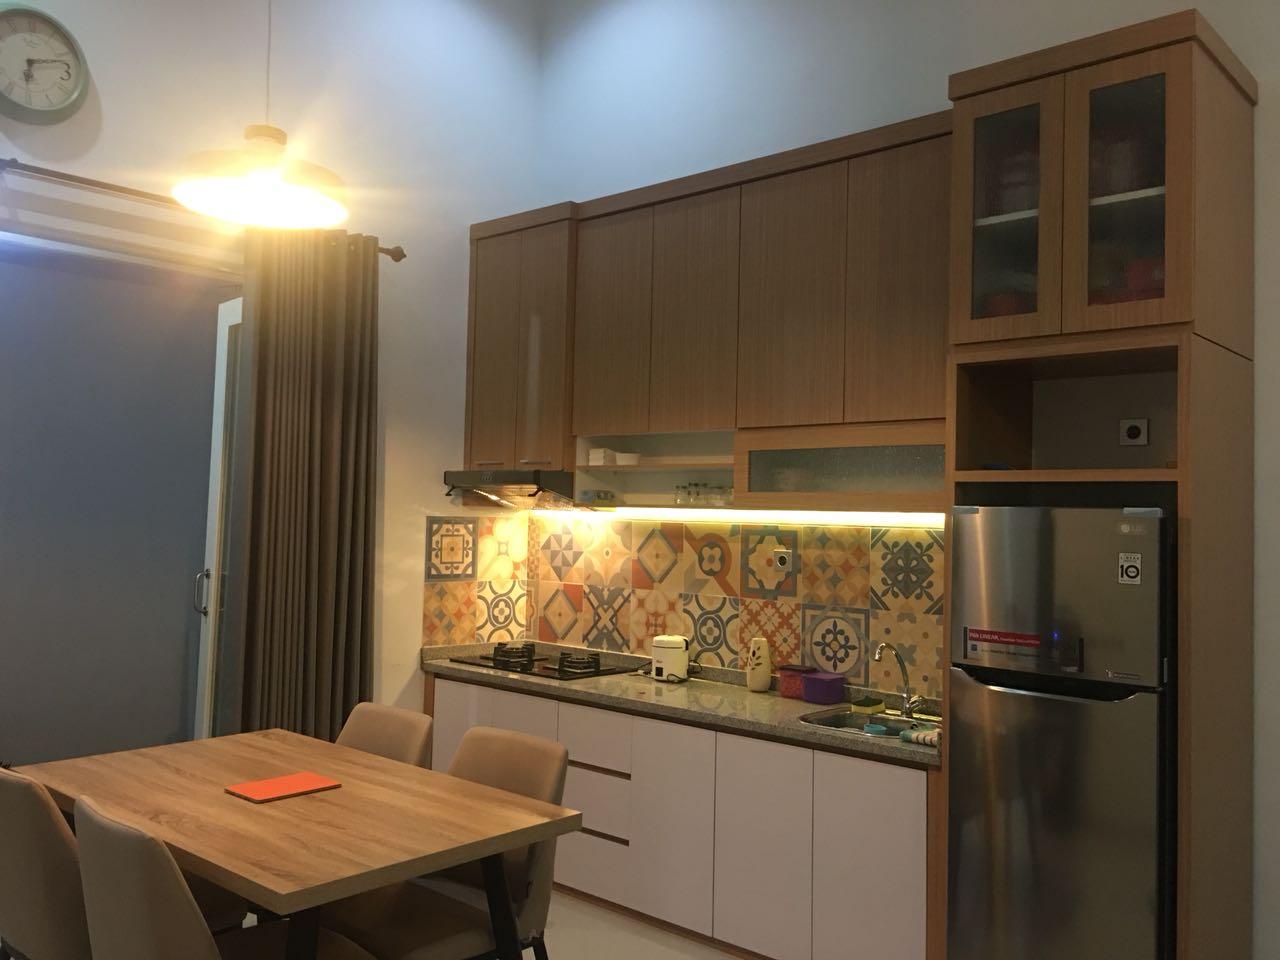 Harga Kitchen Set Kota Malang